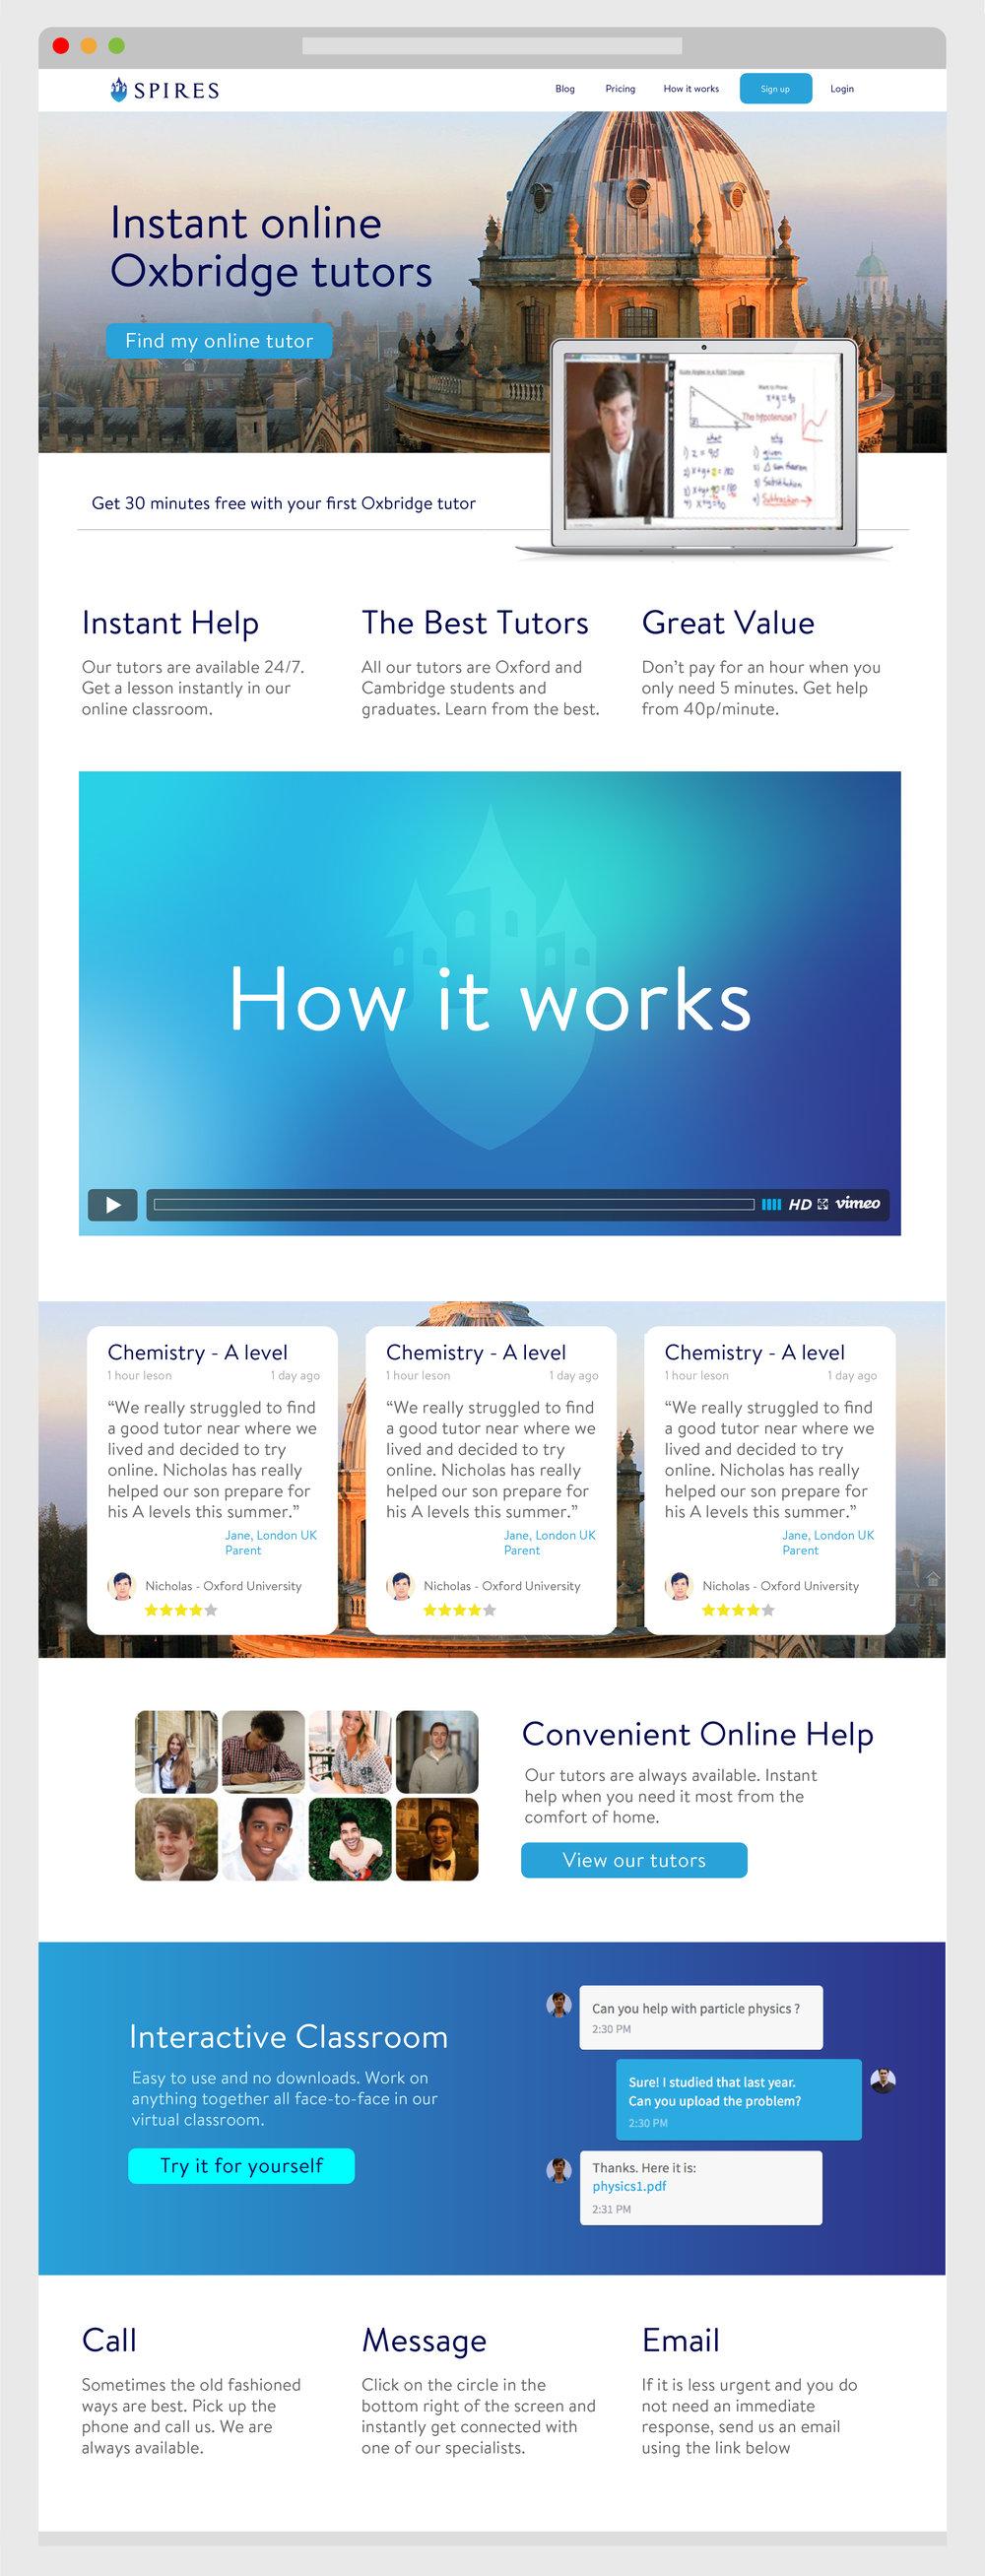 Spires web design